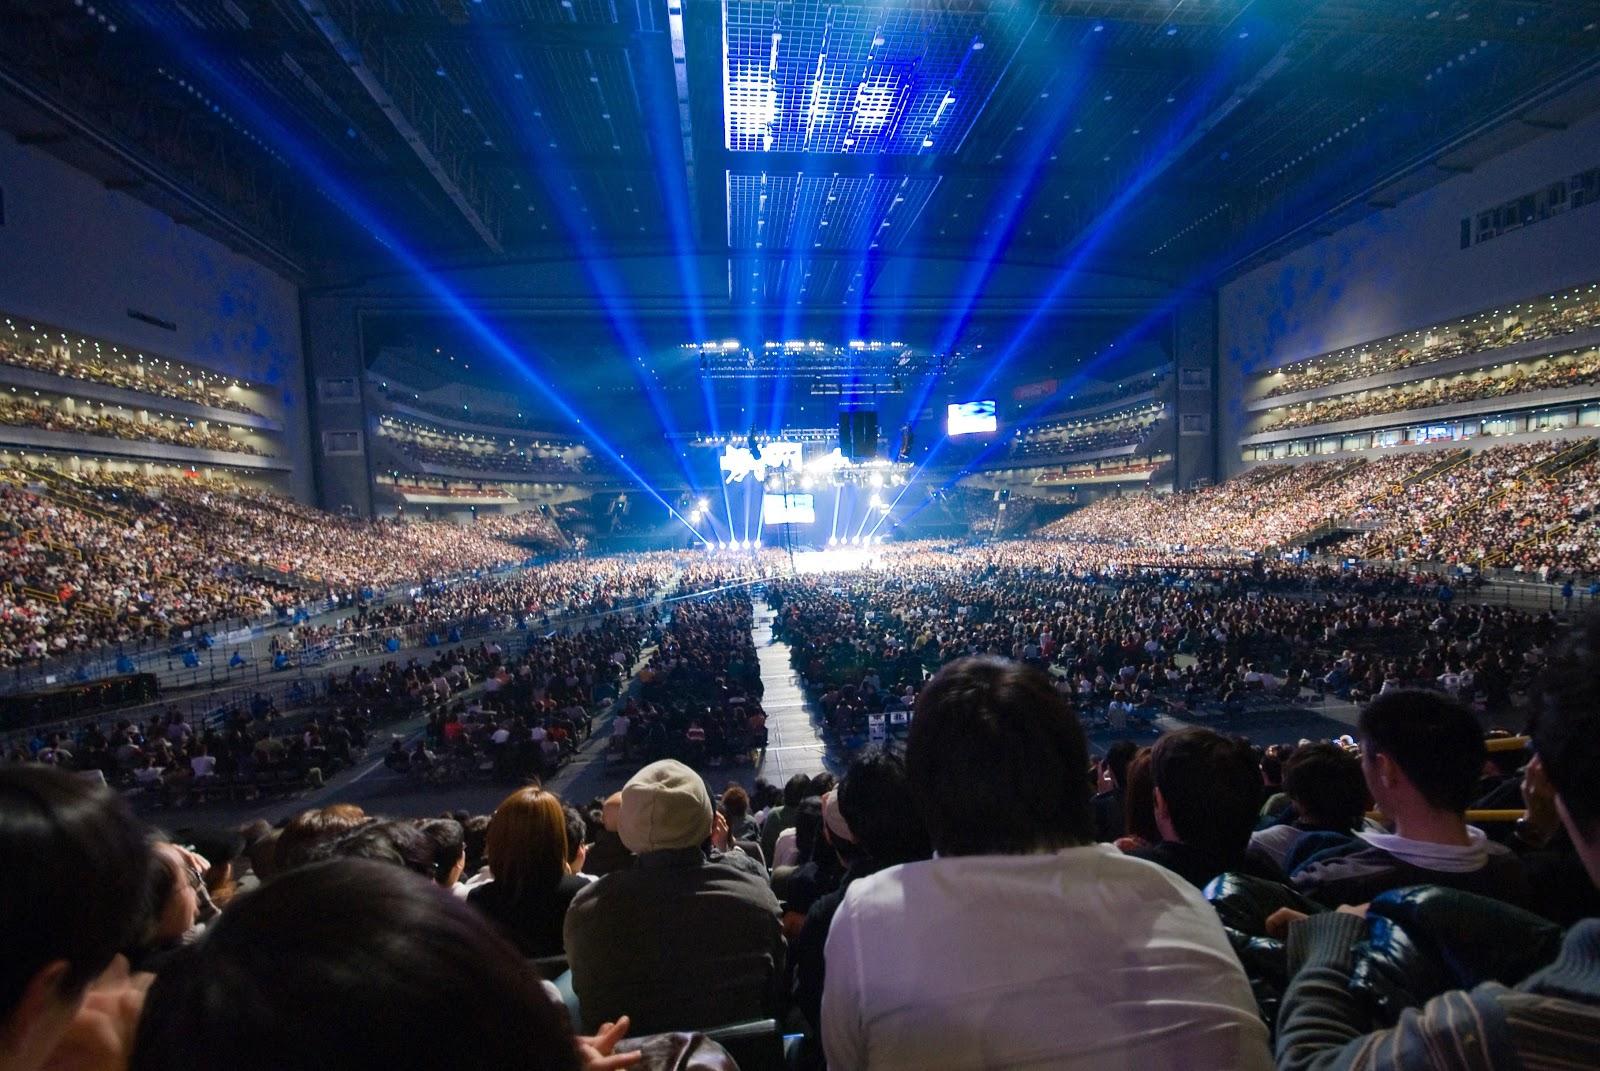 Pure Idol Heart: Momoiro Clover Z Draw 6,000 Fans + A Saitama Super Arena Date